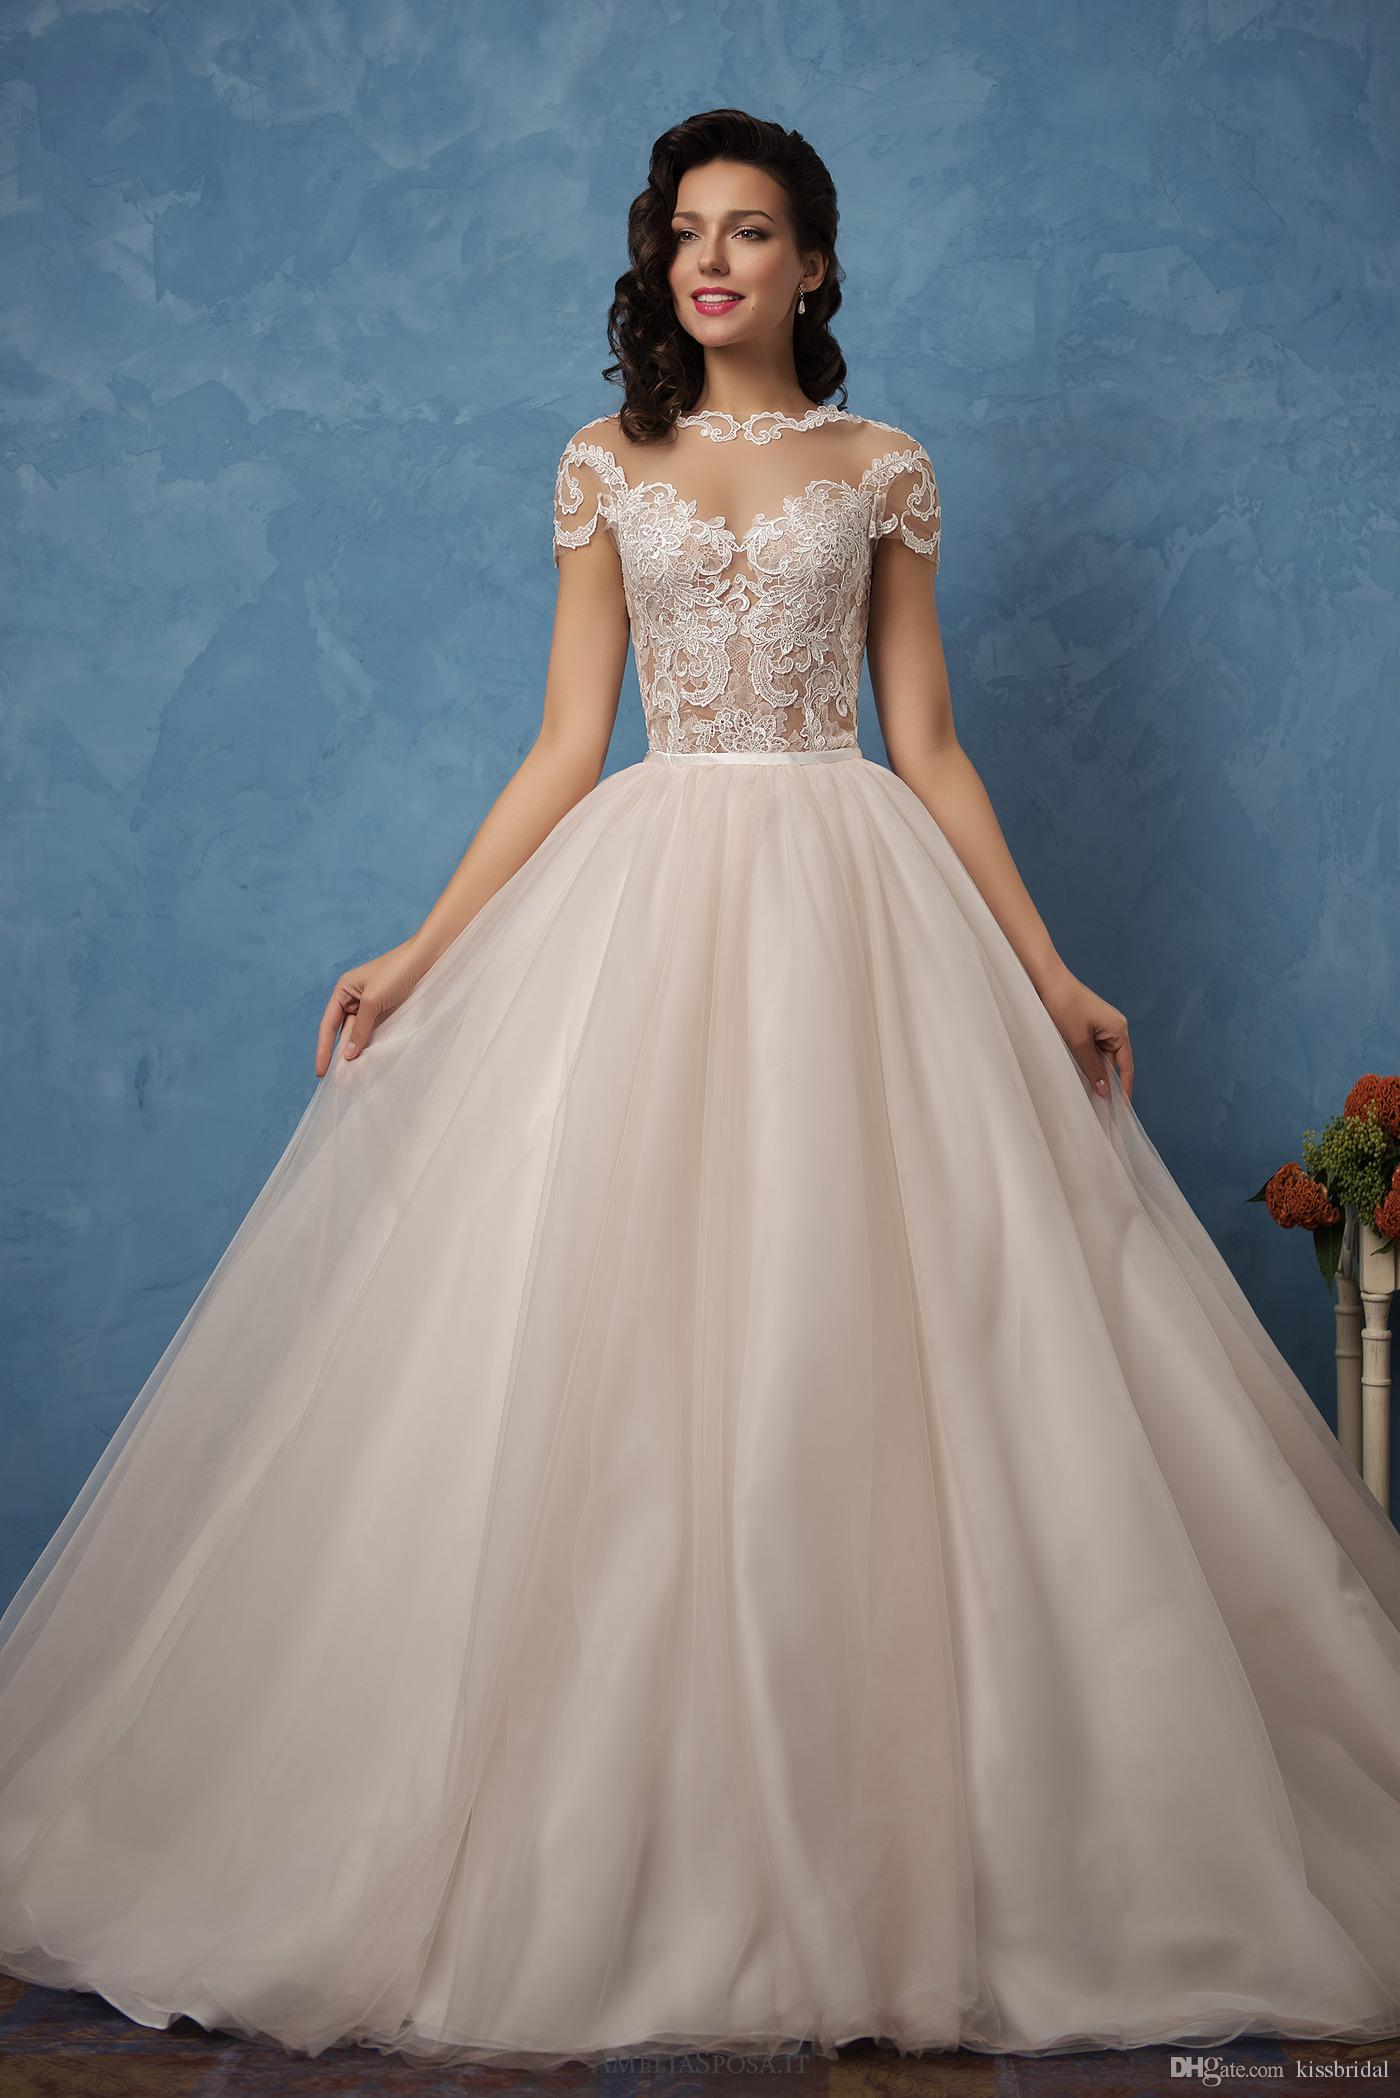 3fd39860c4c 2019 Elegant Lace Wedding Dresses Sheer Illusion Bodice Short Sleeve Bridal  Gowns vestidos de novia Mermaid